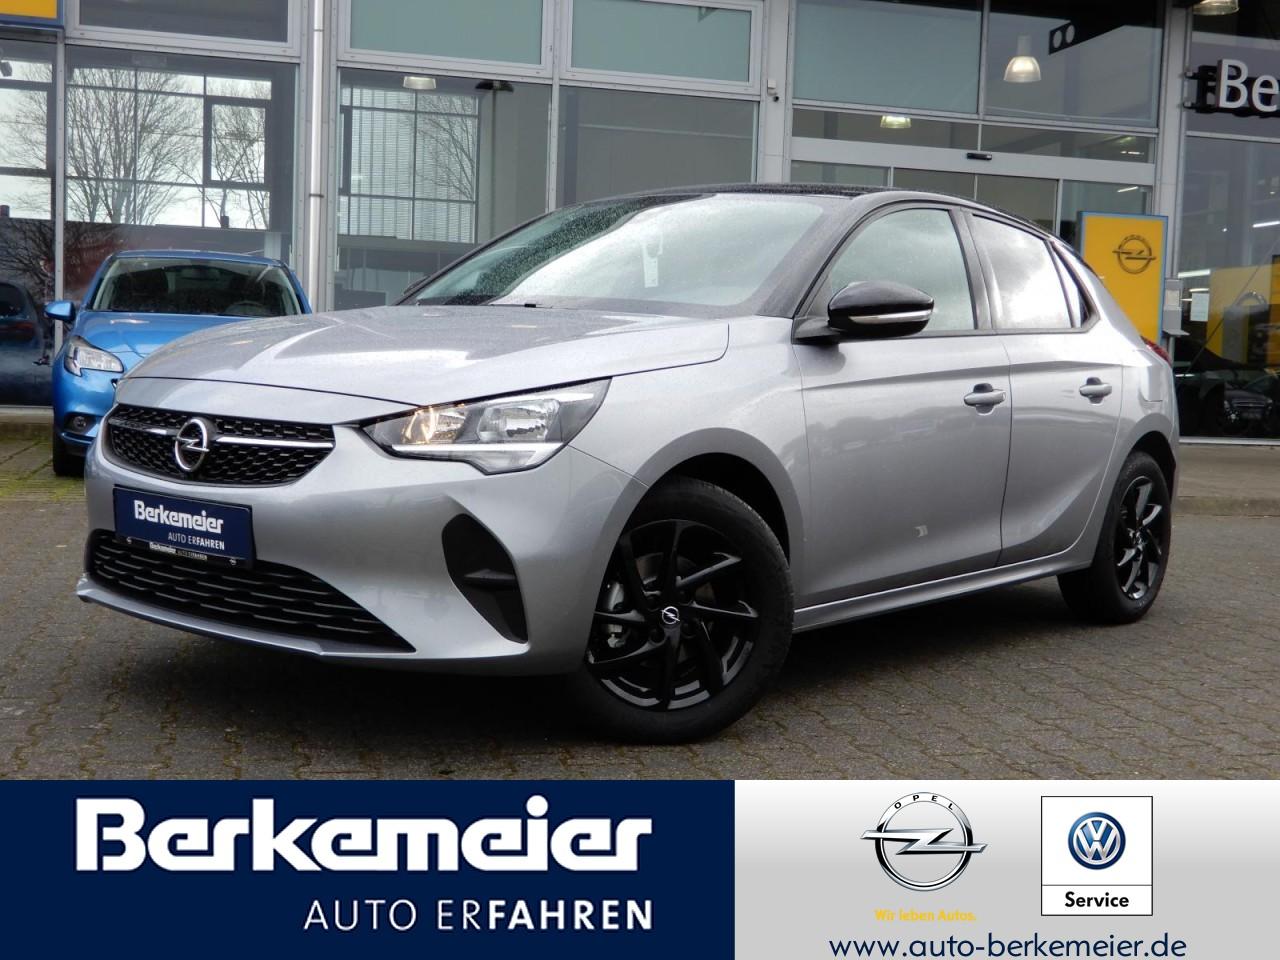 Opel Corsa Edition 1.2 *Multimedia/Parkpilot/Alufelgen*, Jahr 2020, Benzin